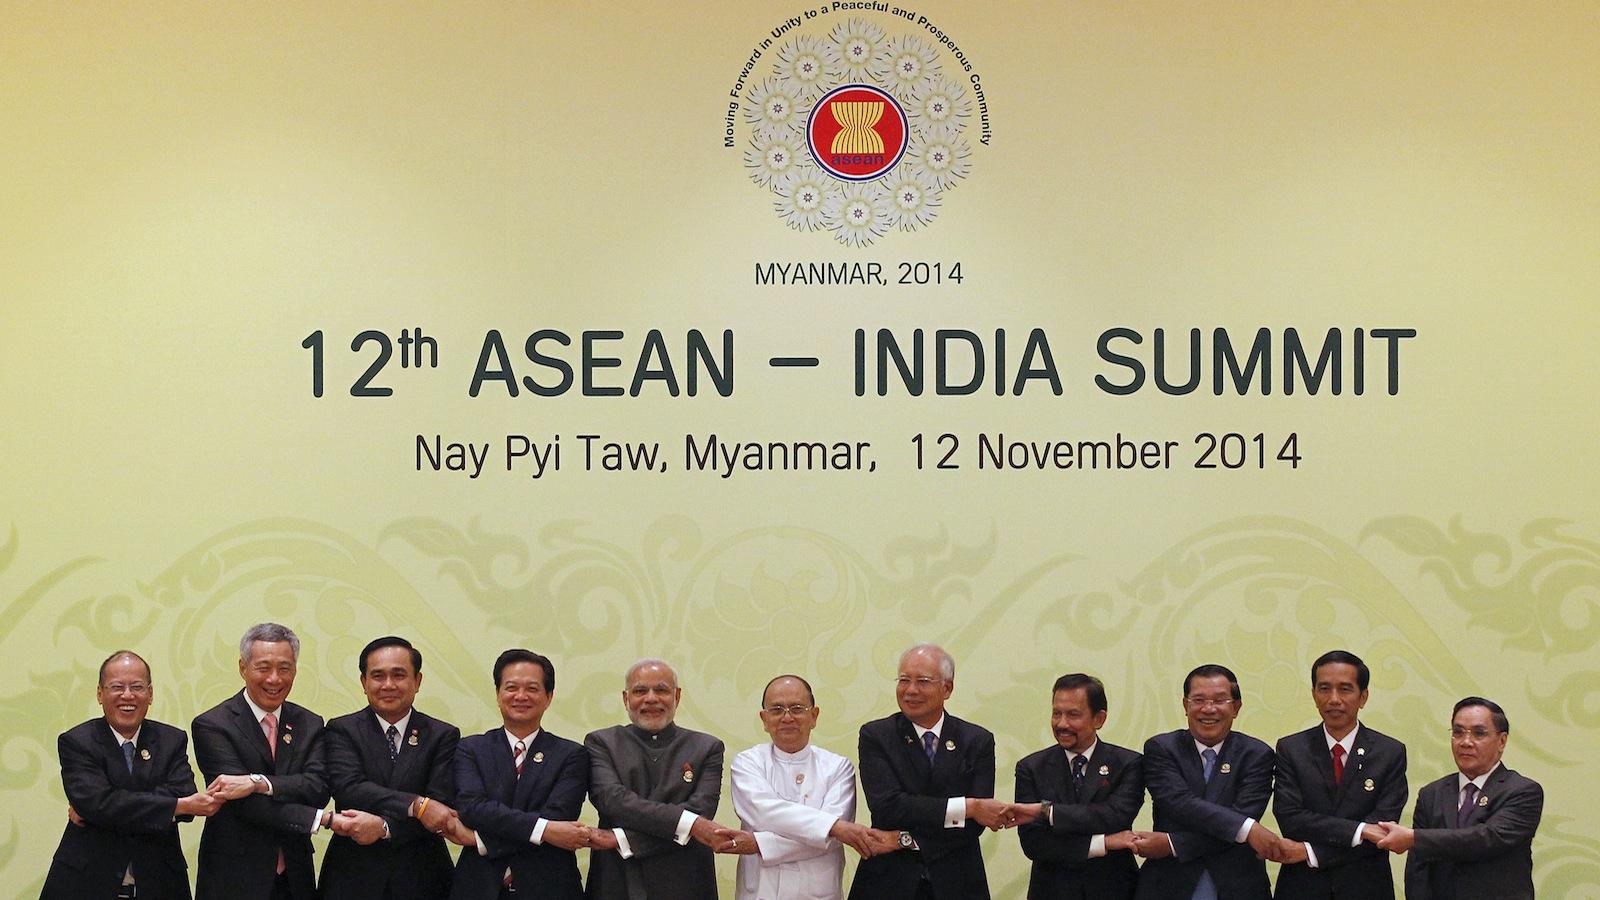 (L-R) Philippine President Benigno Aquino, Singapore's Prime Minister Lee Hsien Loong, Thailand's Prime Minister Prayuth Chan-ocha, Vietnam's Prime Minister Nguyen Tan Dung, Indian Prime Minister Narendra Modi, Myanmar's President Thein Sein, Malaysia's Prime Minister Najib Razak, Brunei's Sultan Hassanal Bolkiah, Cambodia's Prime Minister Hun Sen, Indonesia's President Joko Widodo and Laos' Prime Minister Thongsing Thammavong shake hands before the 12th ASEAN-India Summit during the 25th ASEAN Summit at the Myanmar International Convention Centre in Naypyitaw November 12, 2014. REUTERS/Soe Zeya Tun